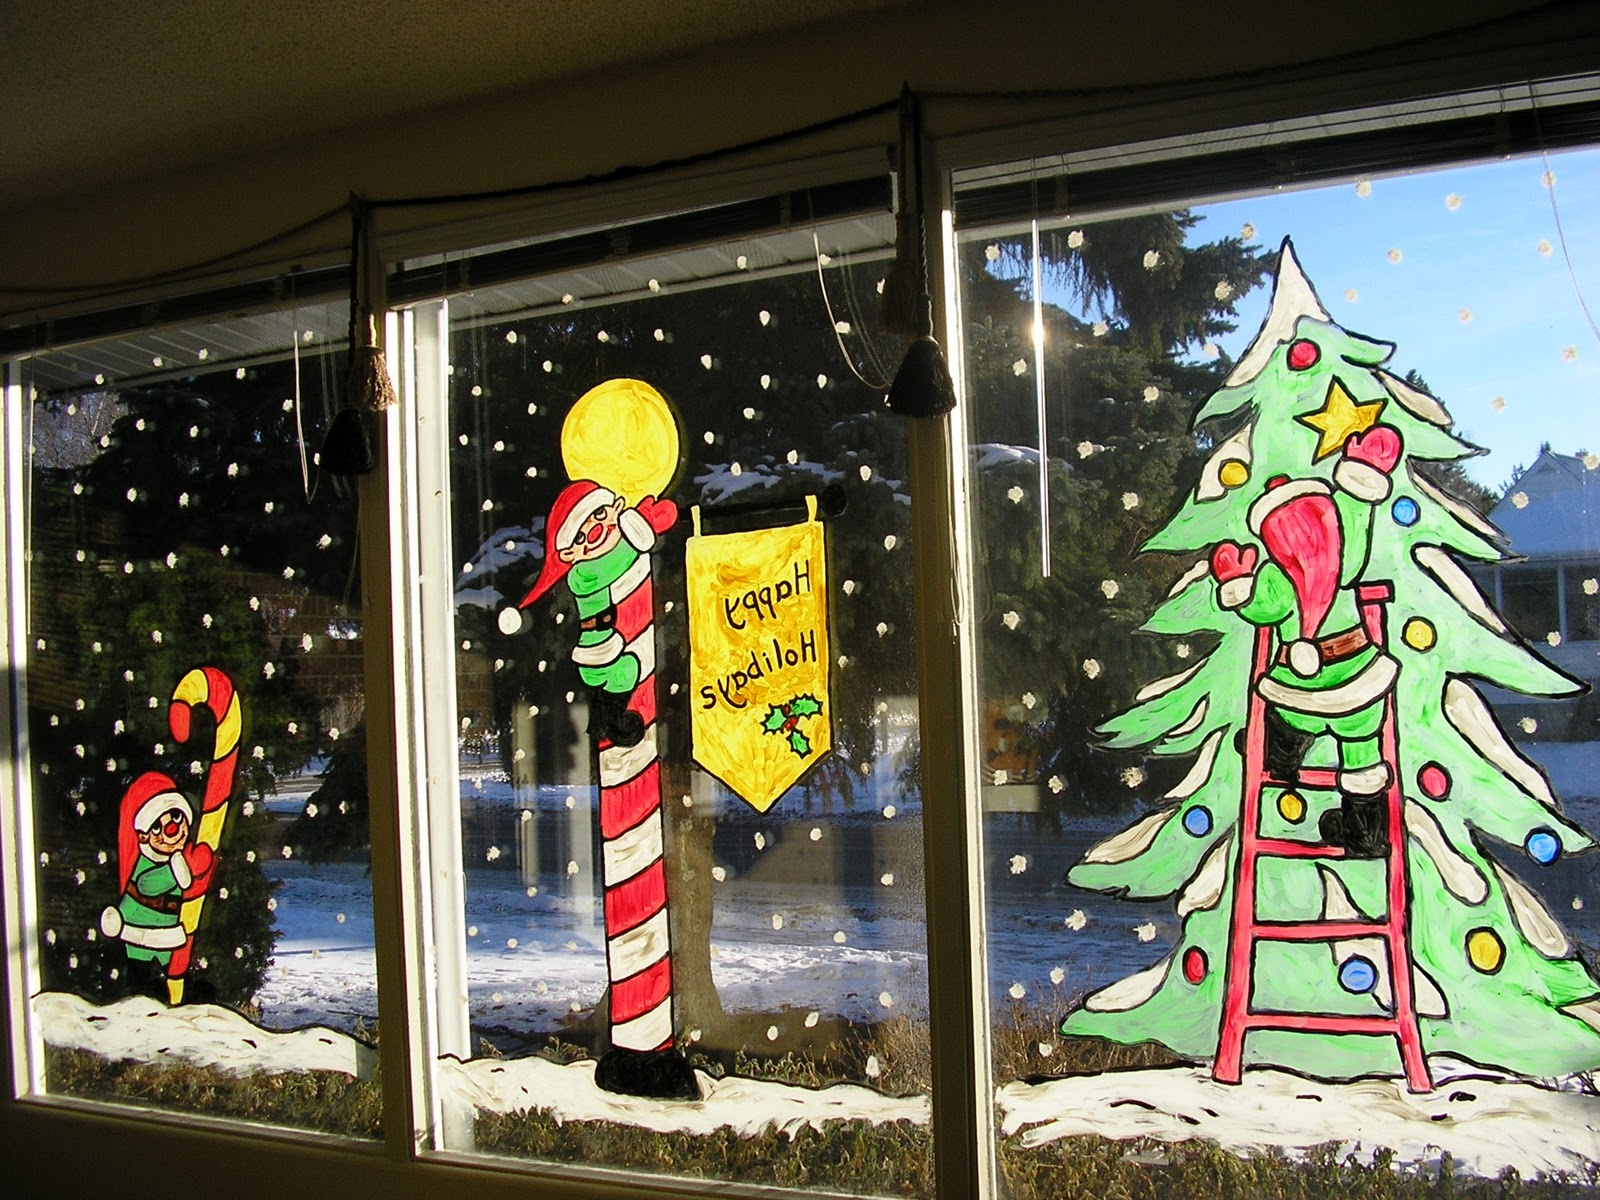 рисование на стекле или декор окна снежным рисунком фото 5